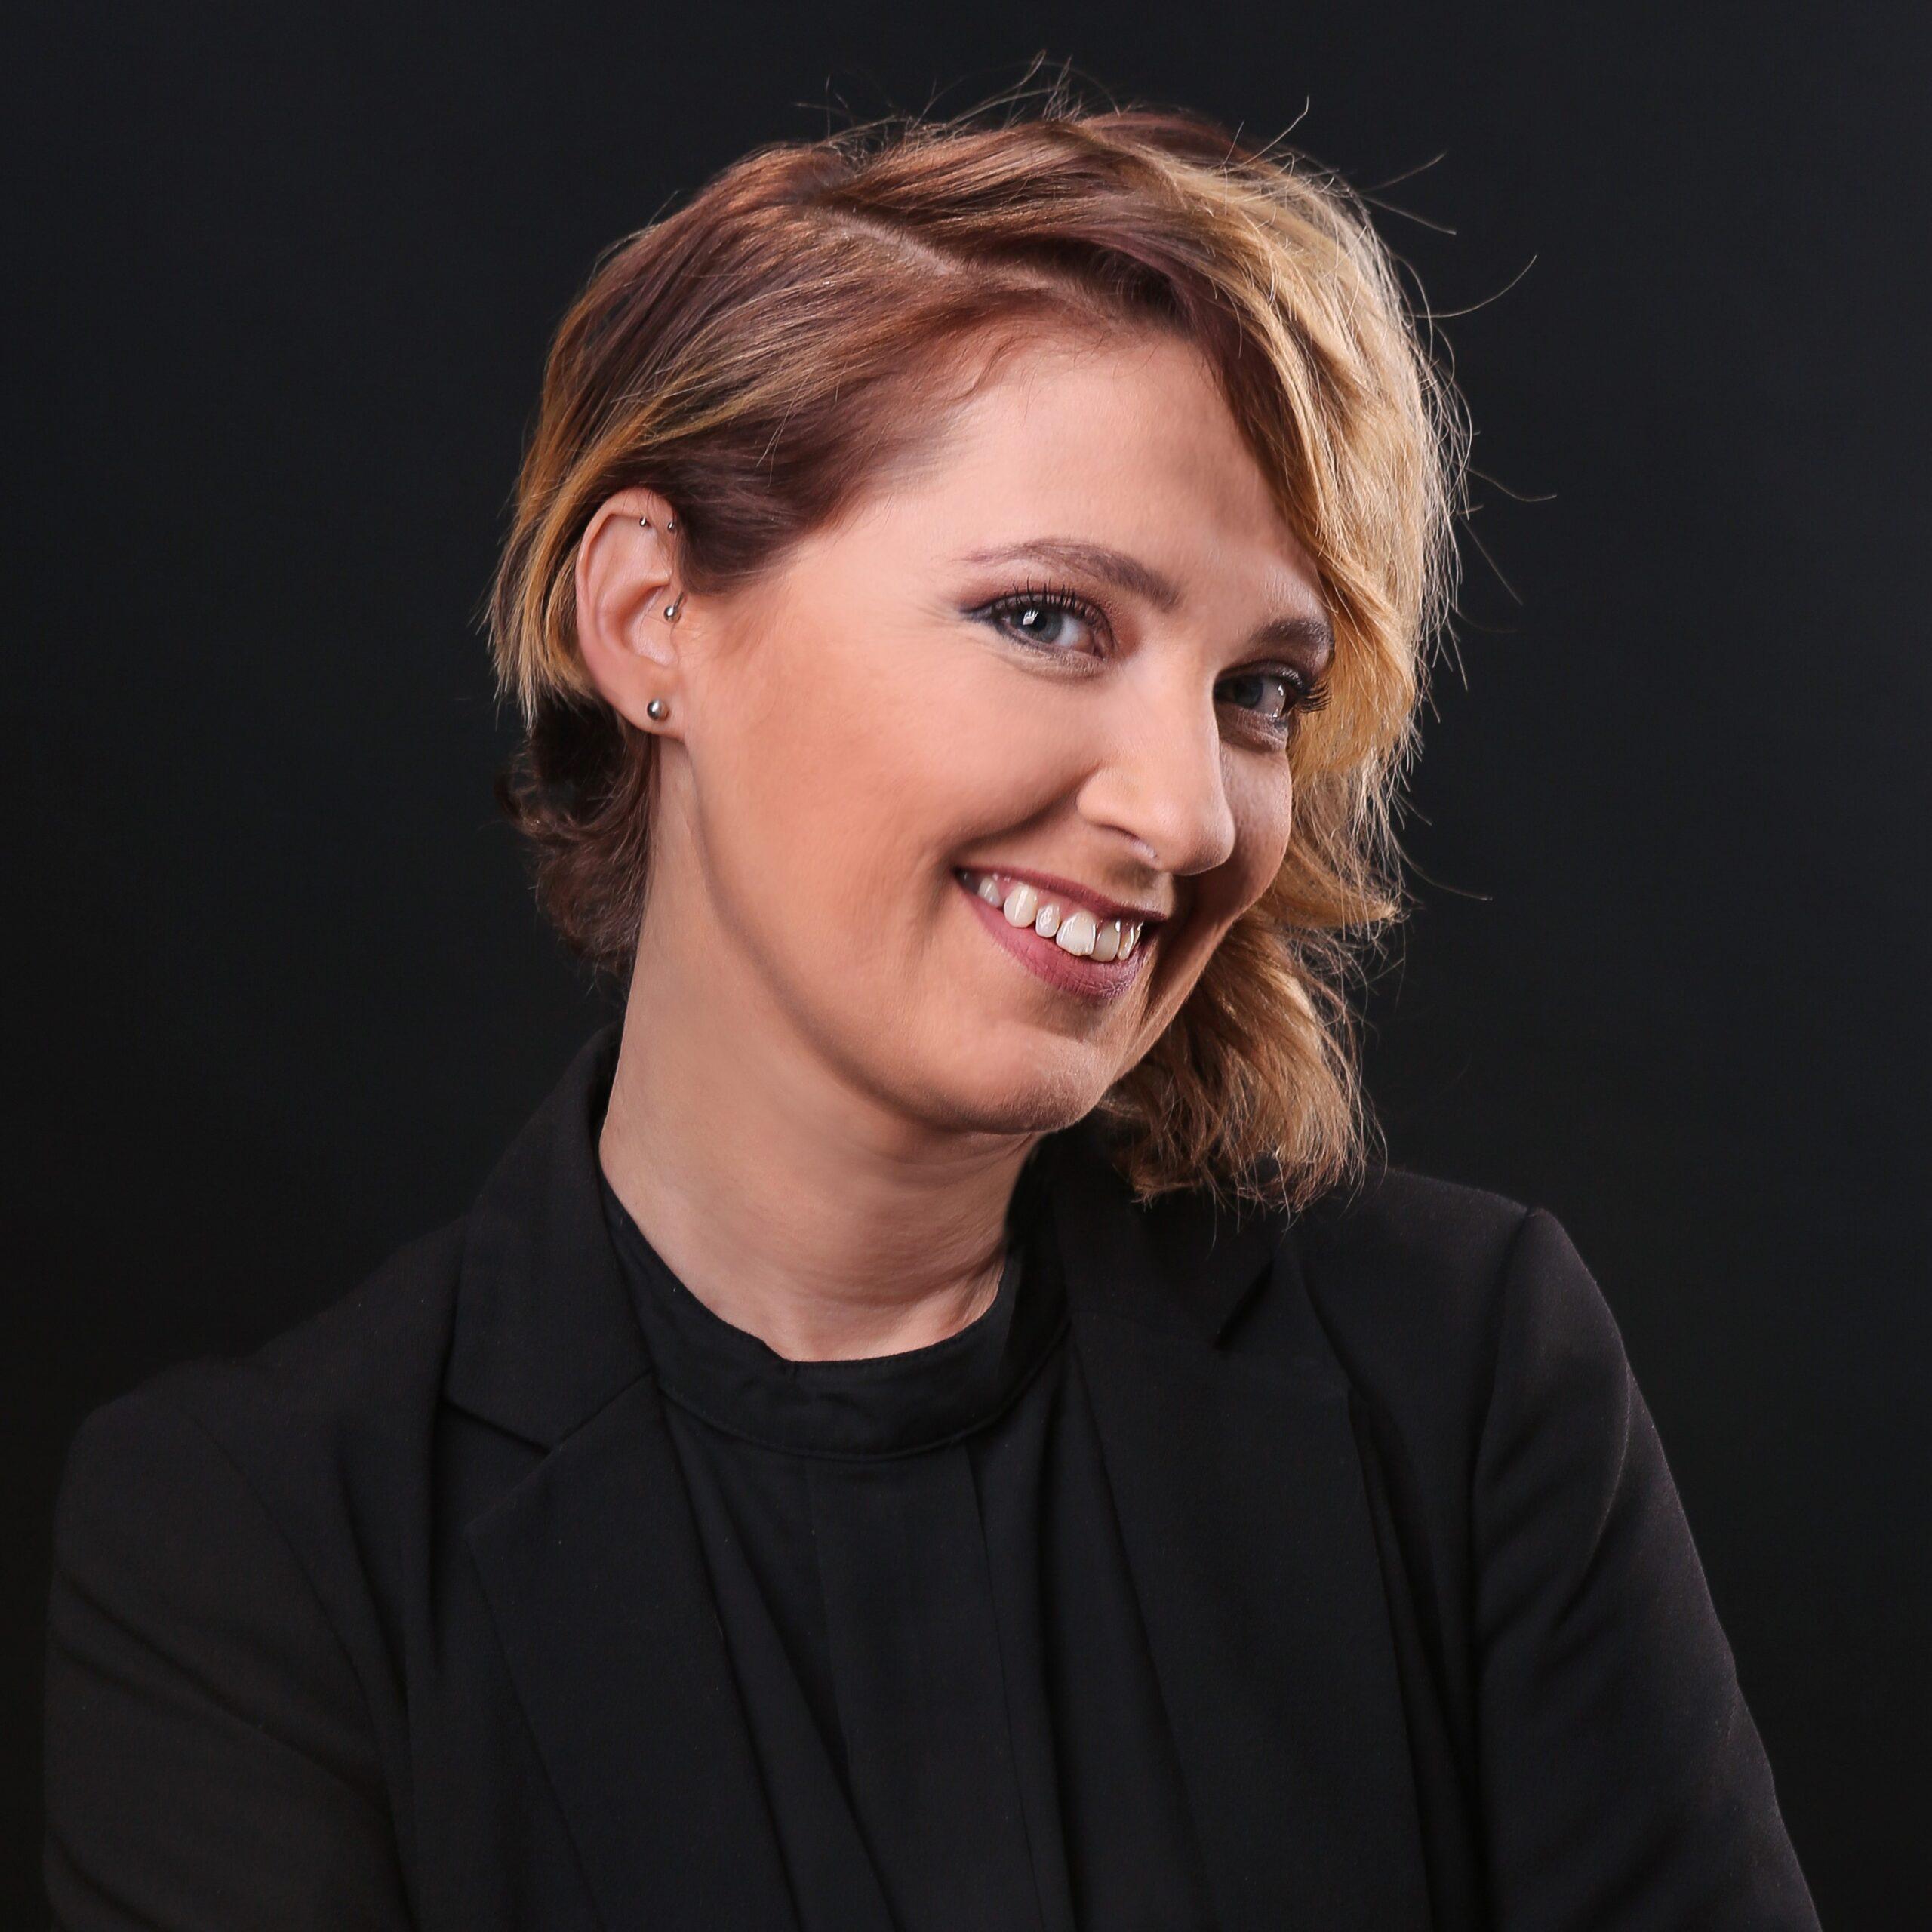 Monika-za-sajt